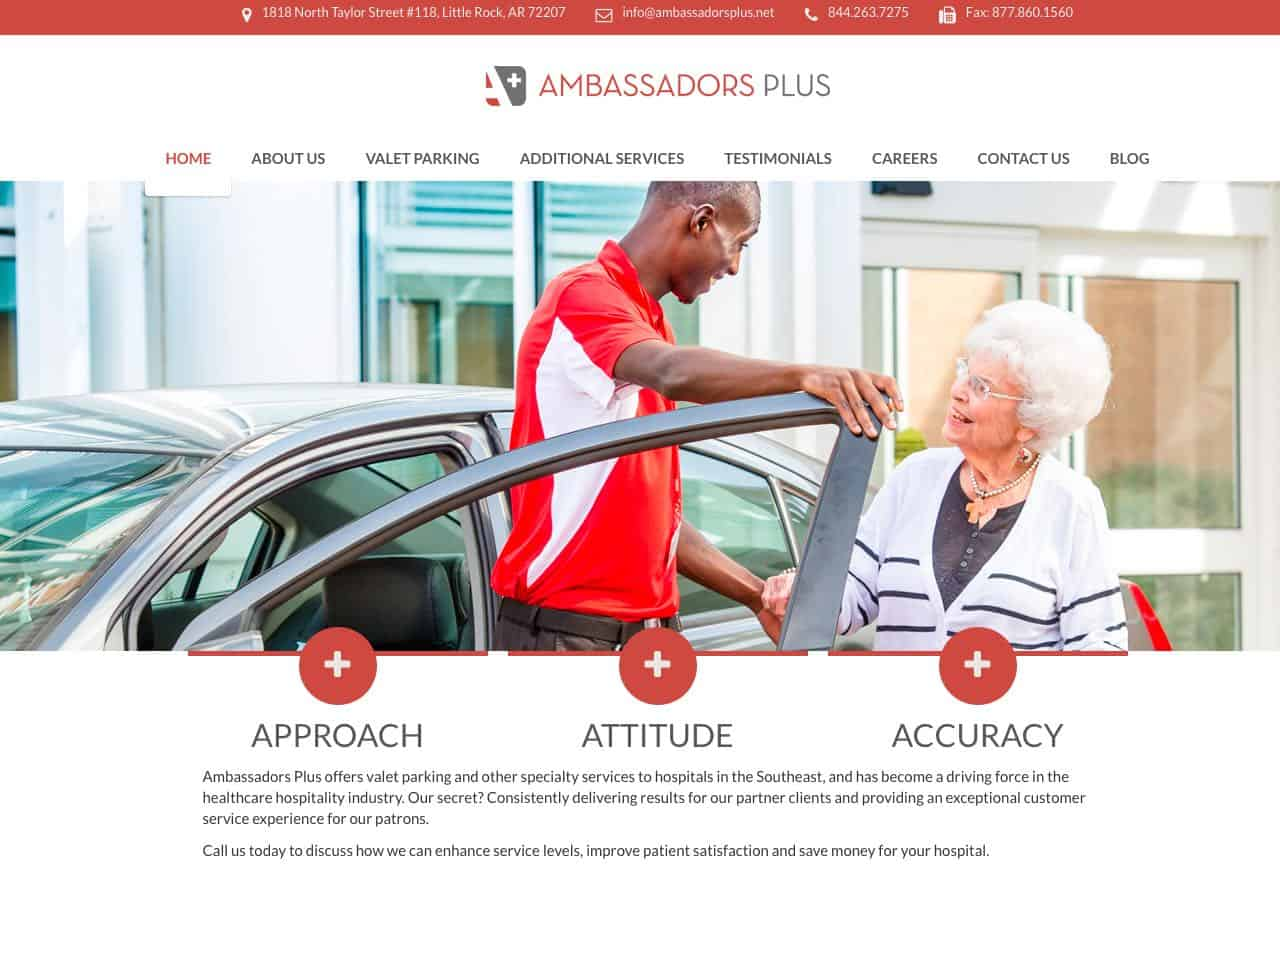 Ambassadors Plus